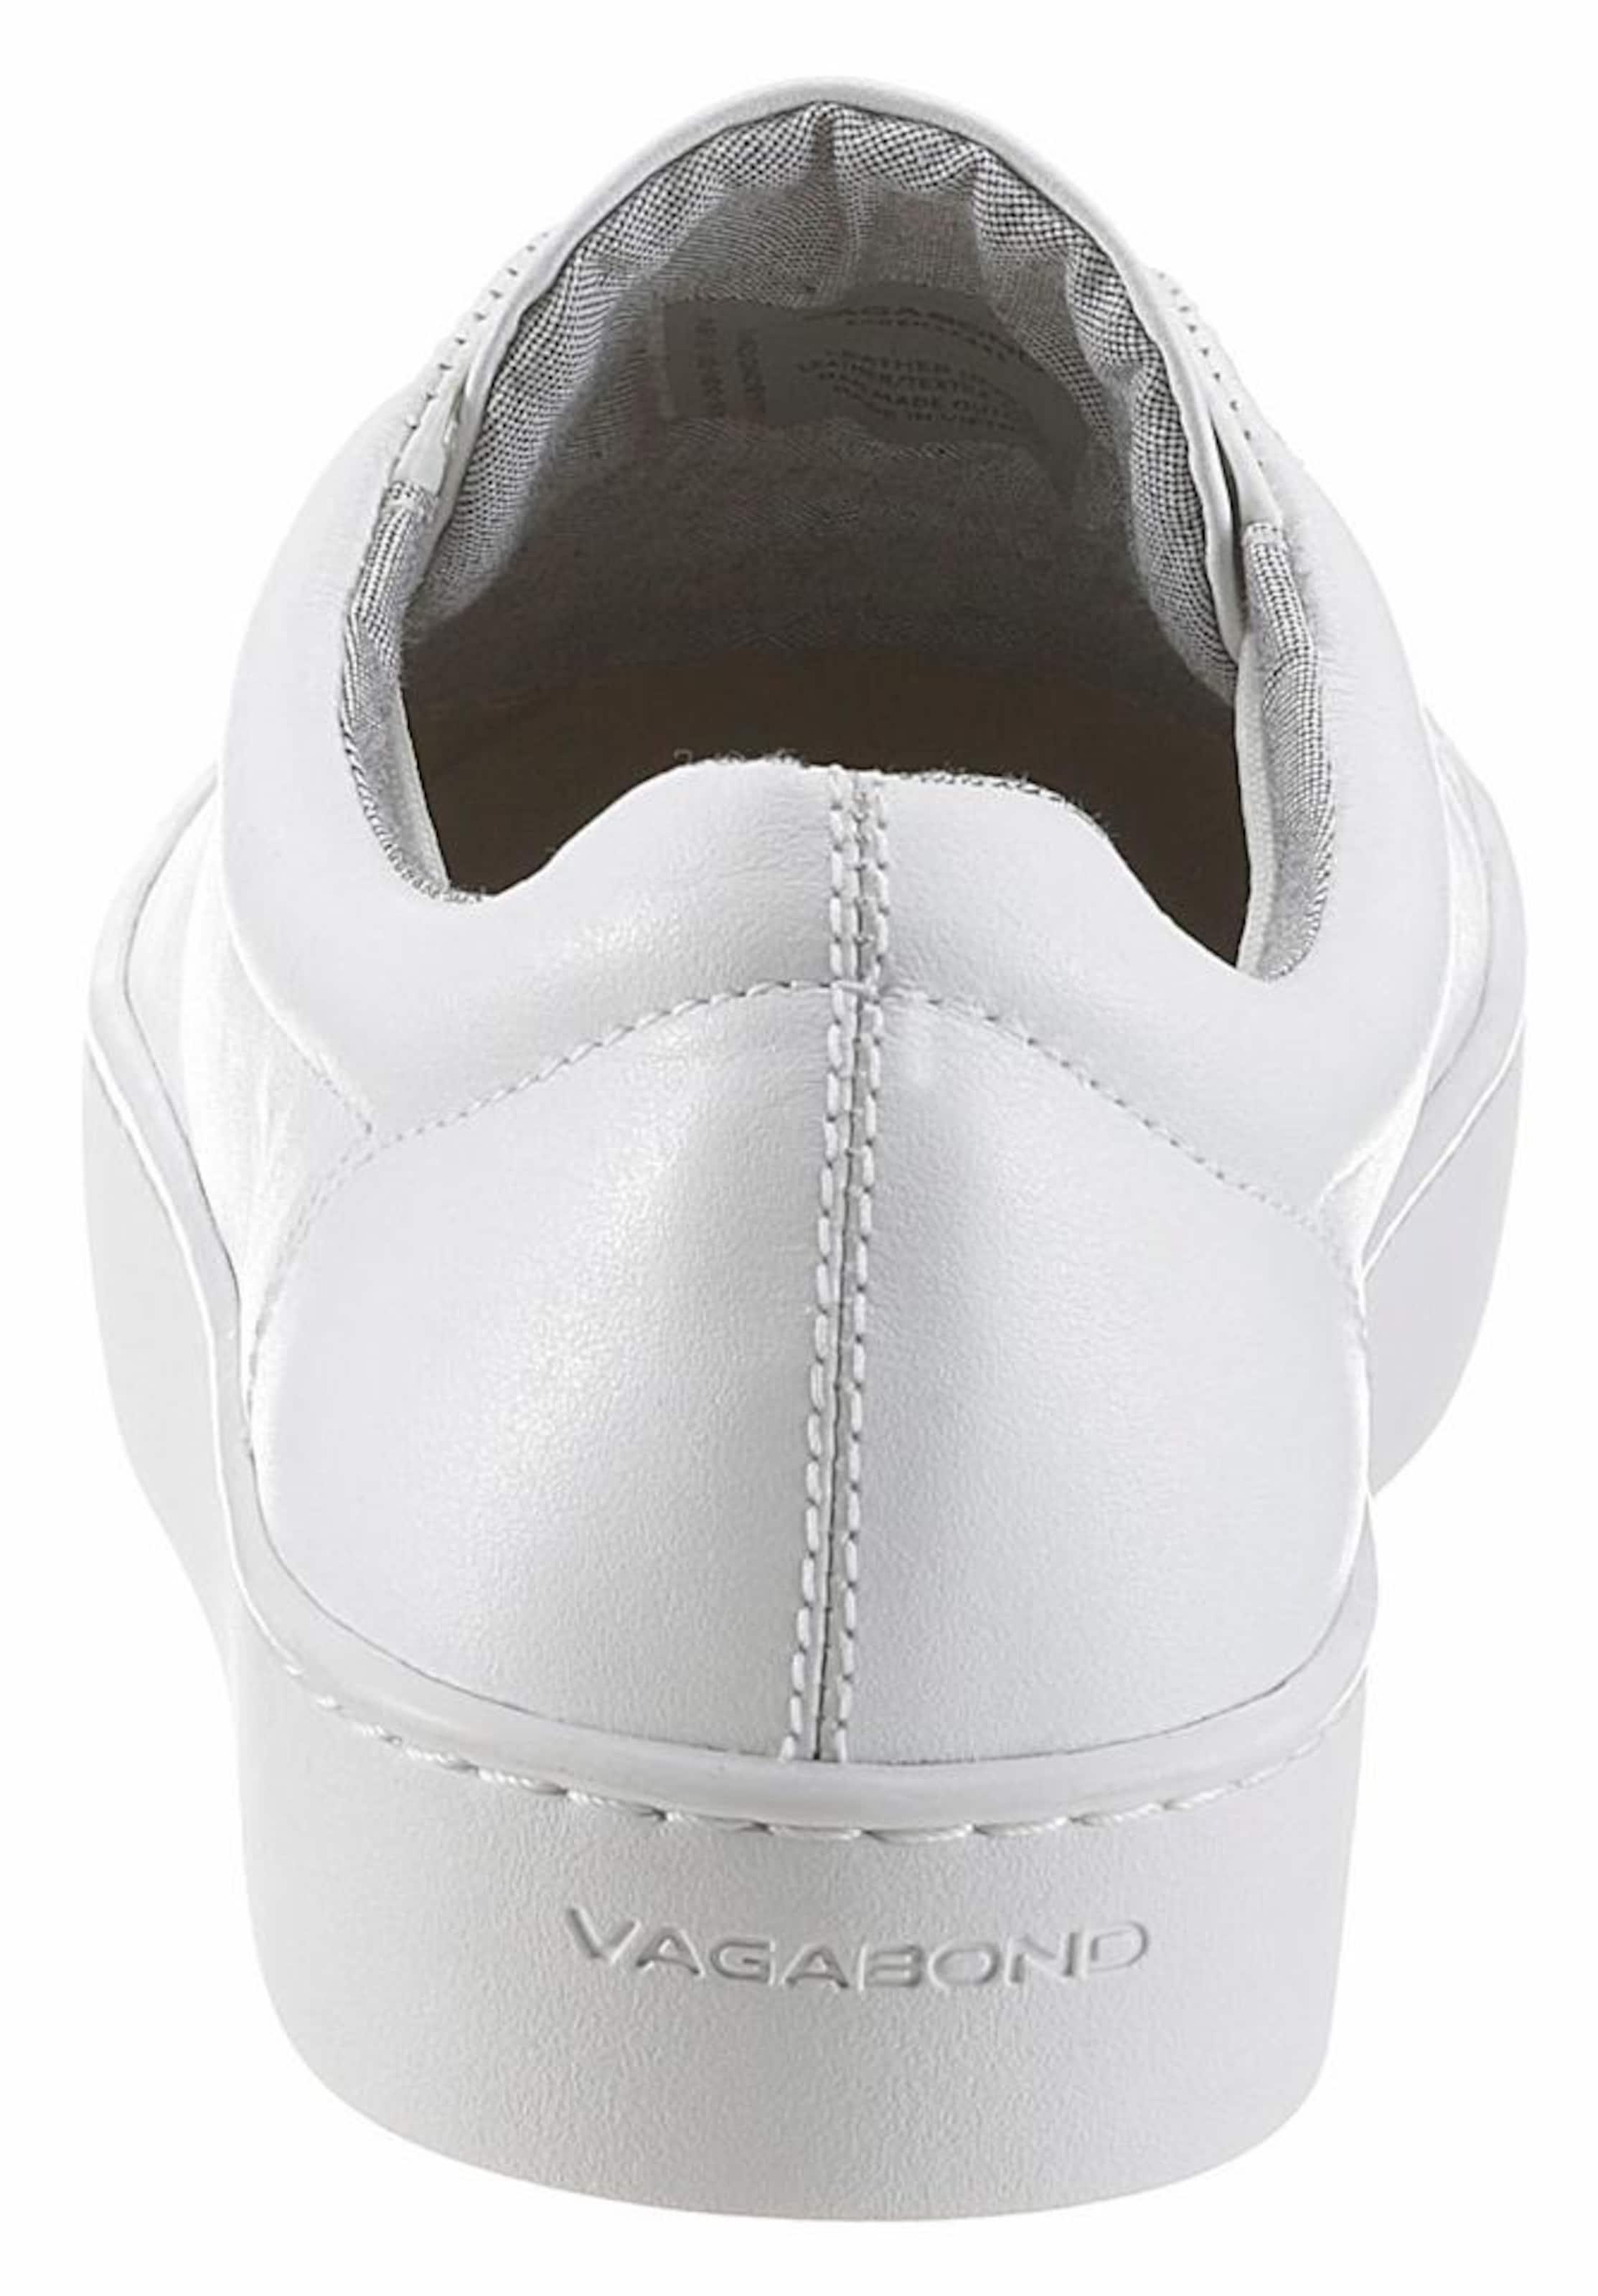 Weiß Sneaker Shoemakers In Vagabond Sneaker Shoemakers Vagabond UzMpVqS